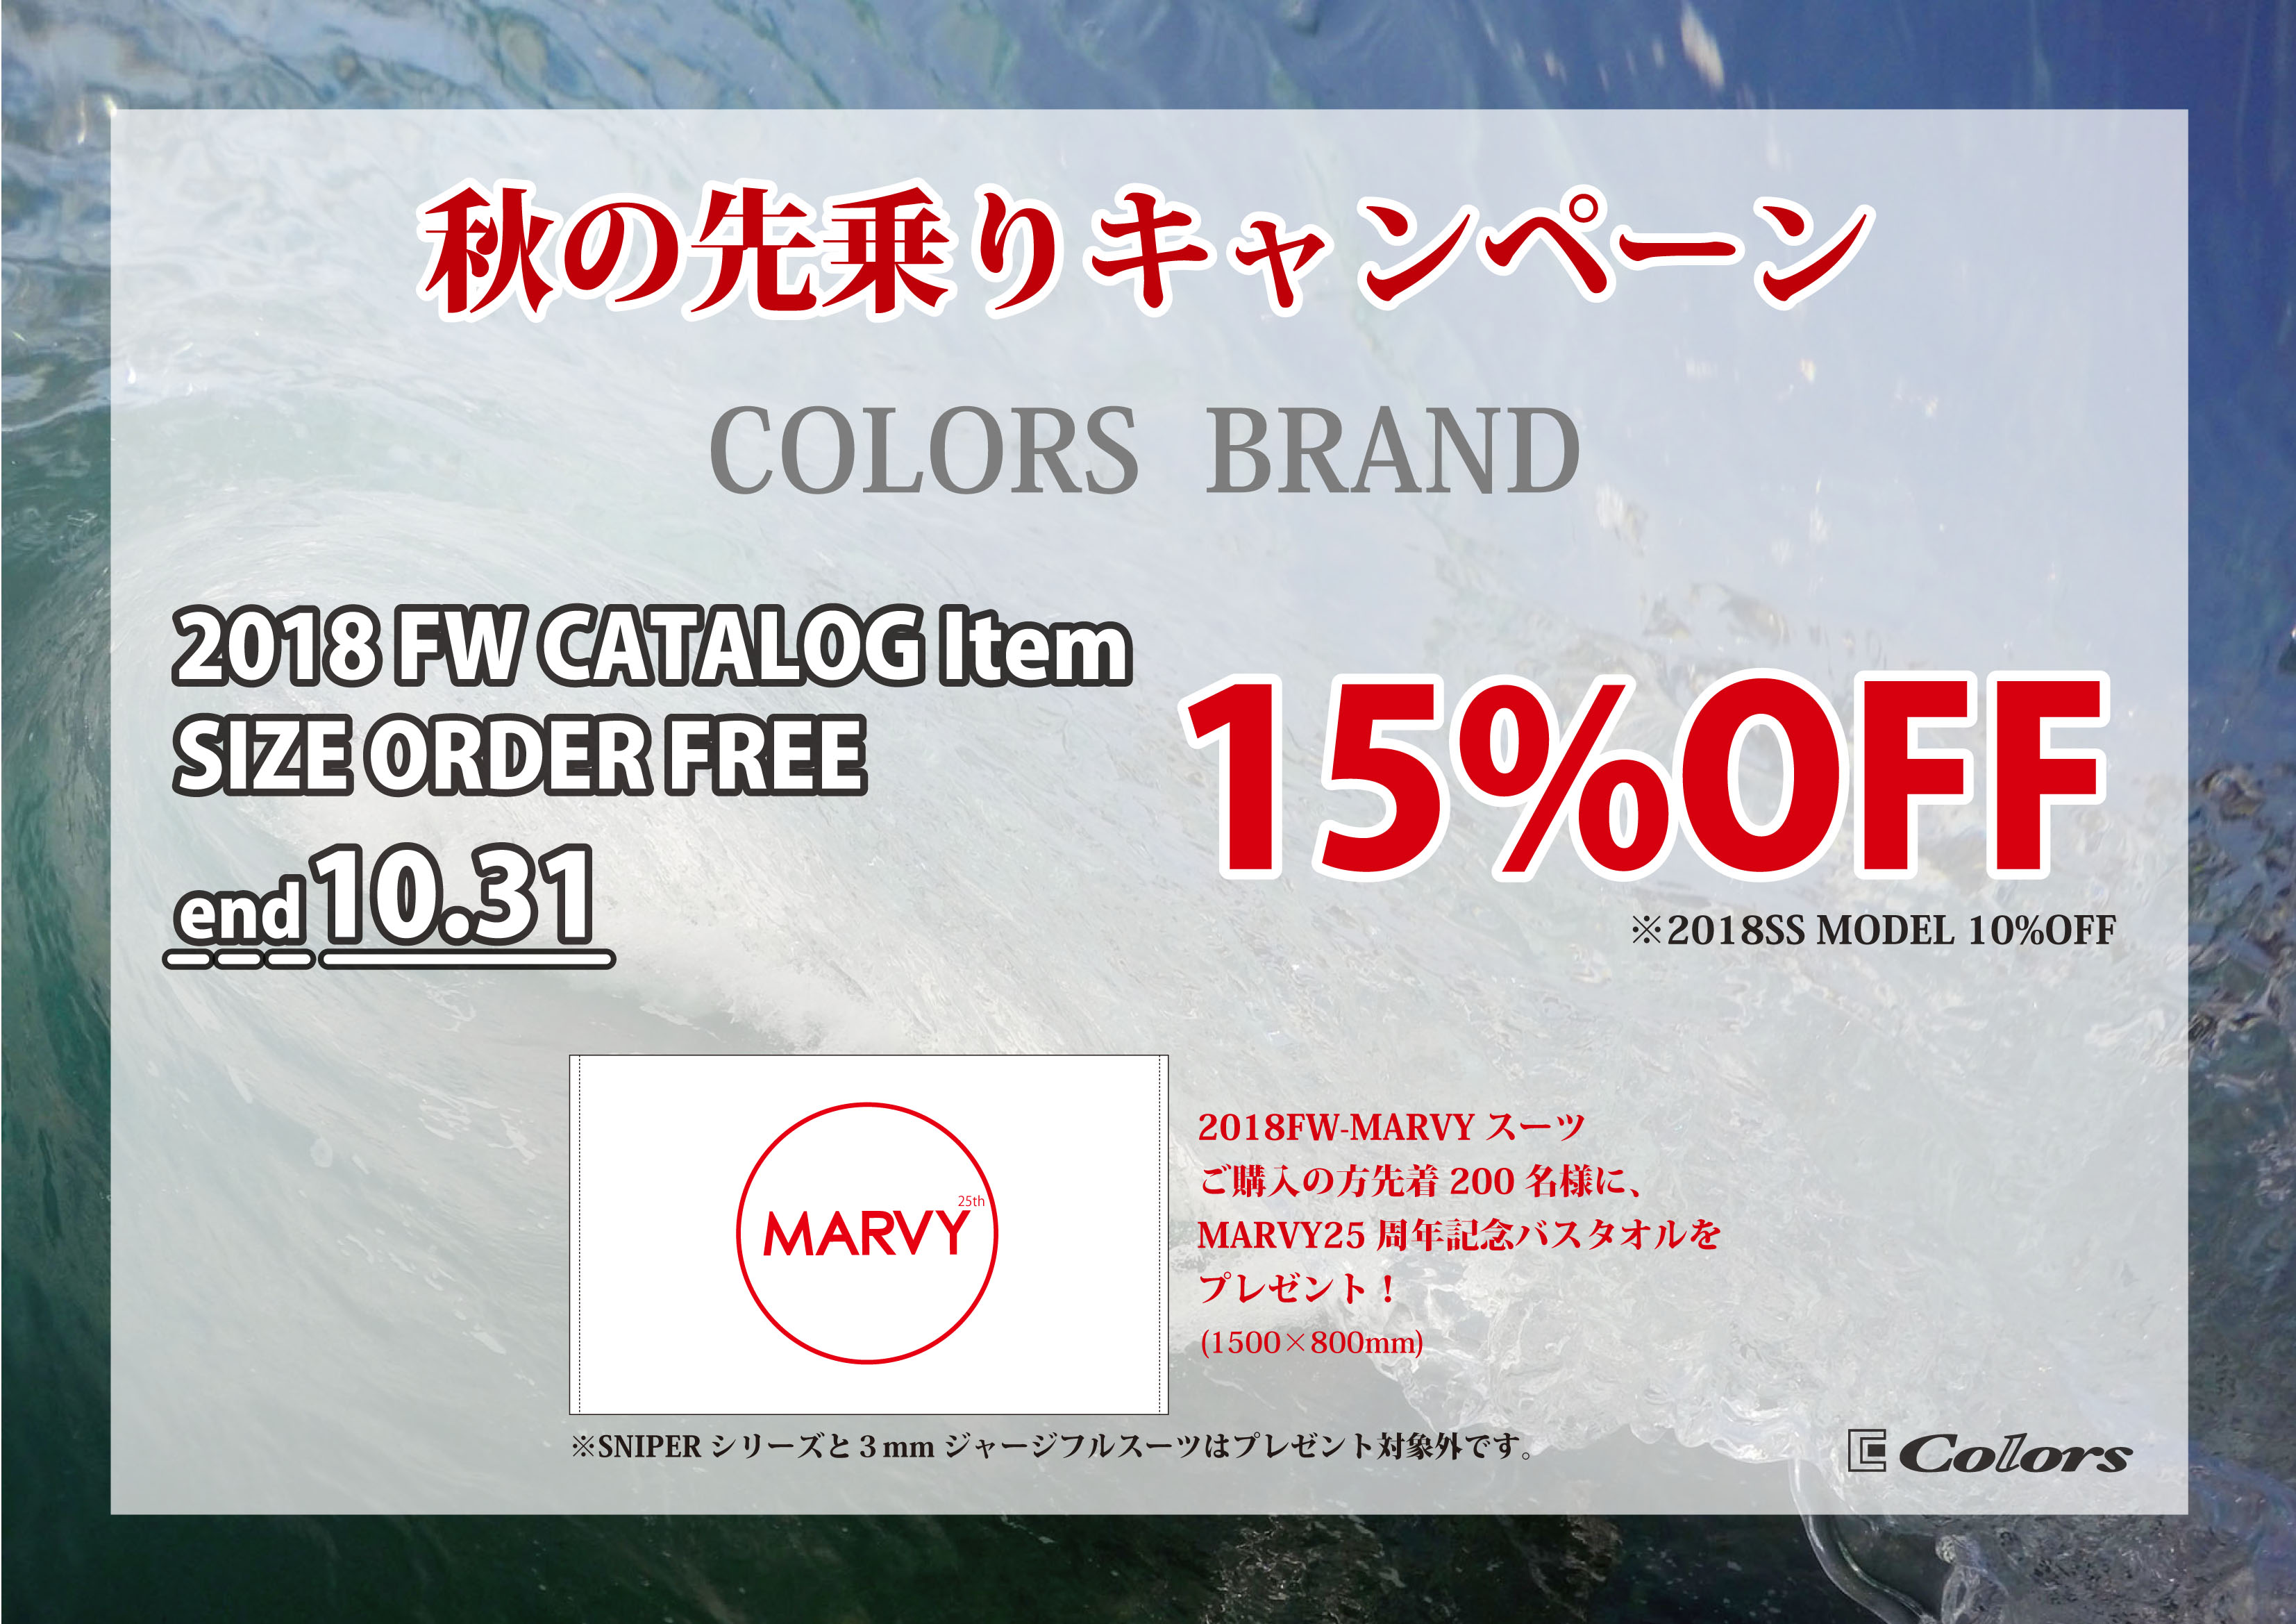 2018FW_MARVY_15%OFFキャンペーン告知広告